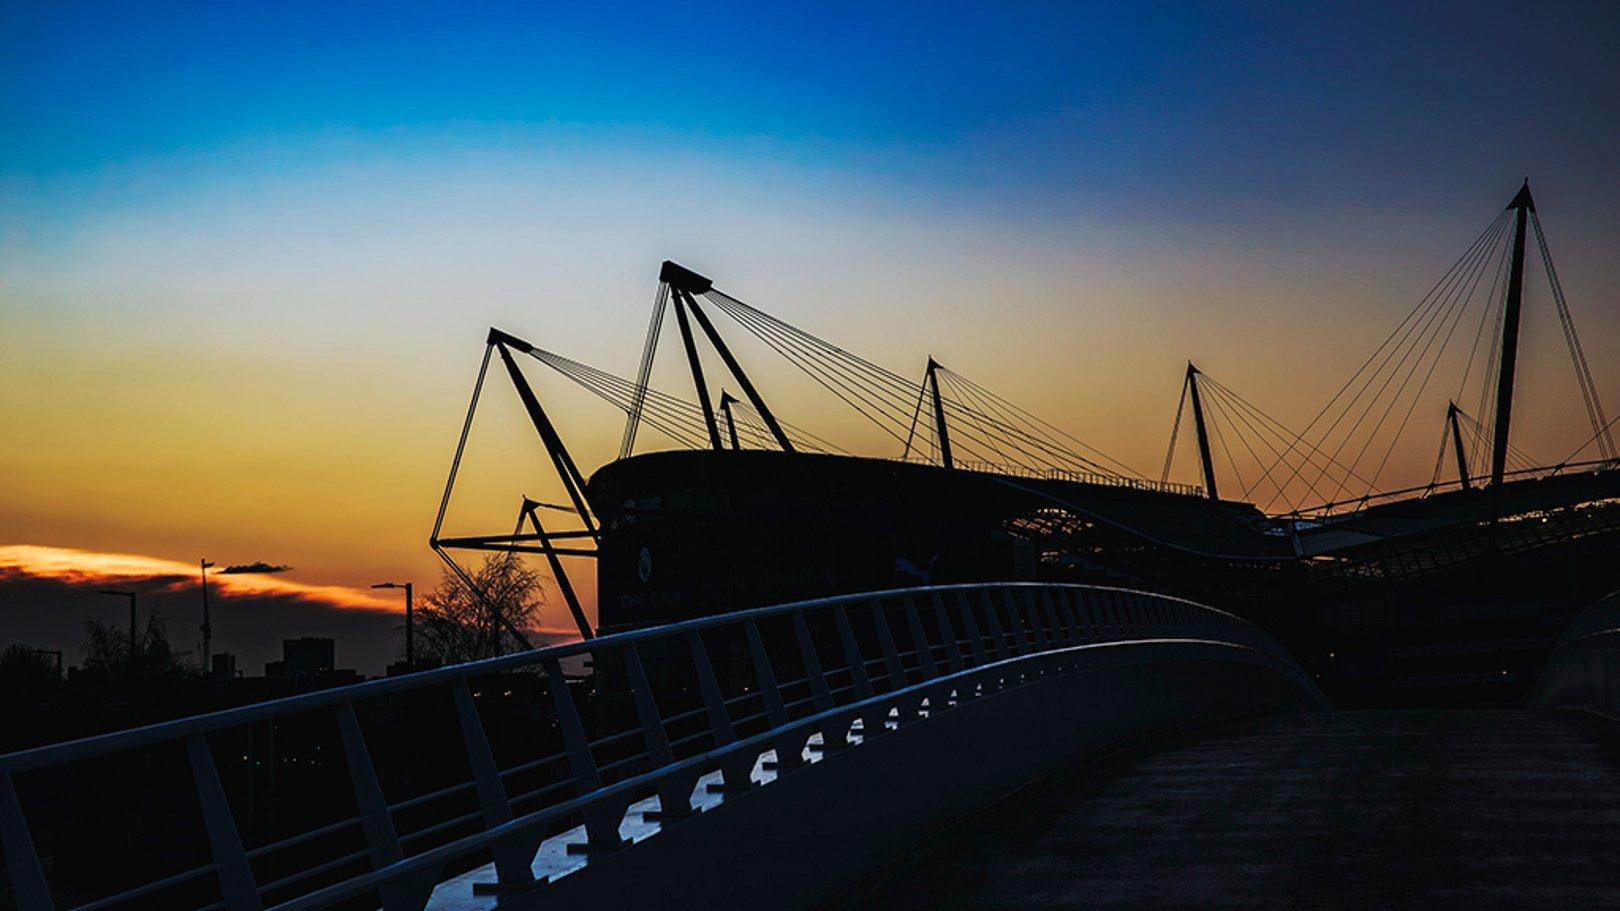 SUNSET SILHOUETTE: A wonderful backdrop frames the Etihad